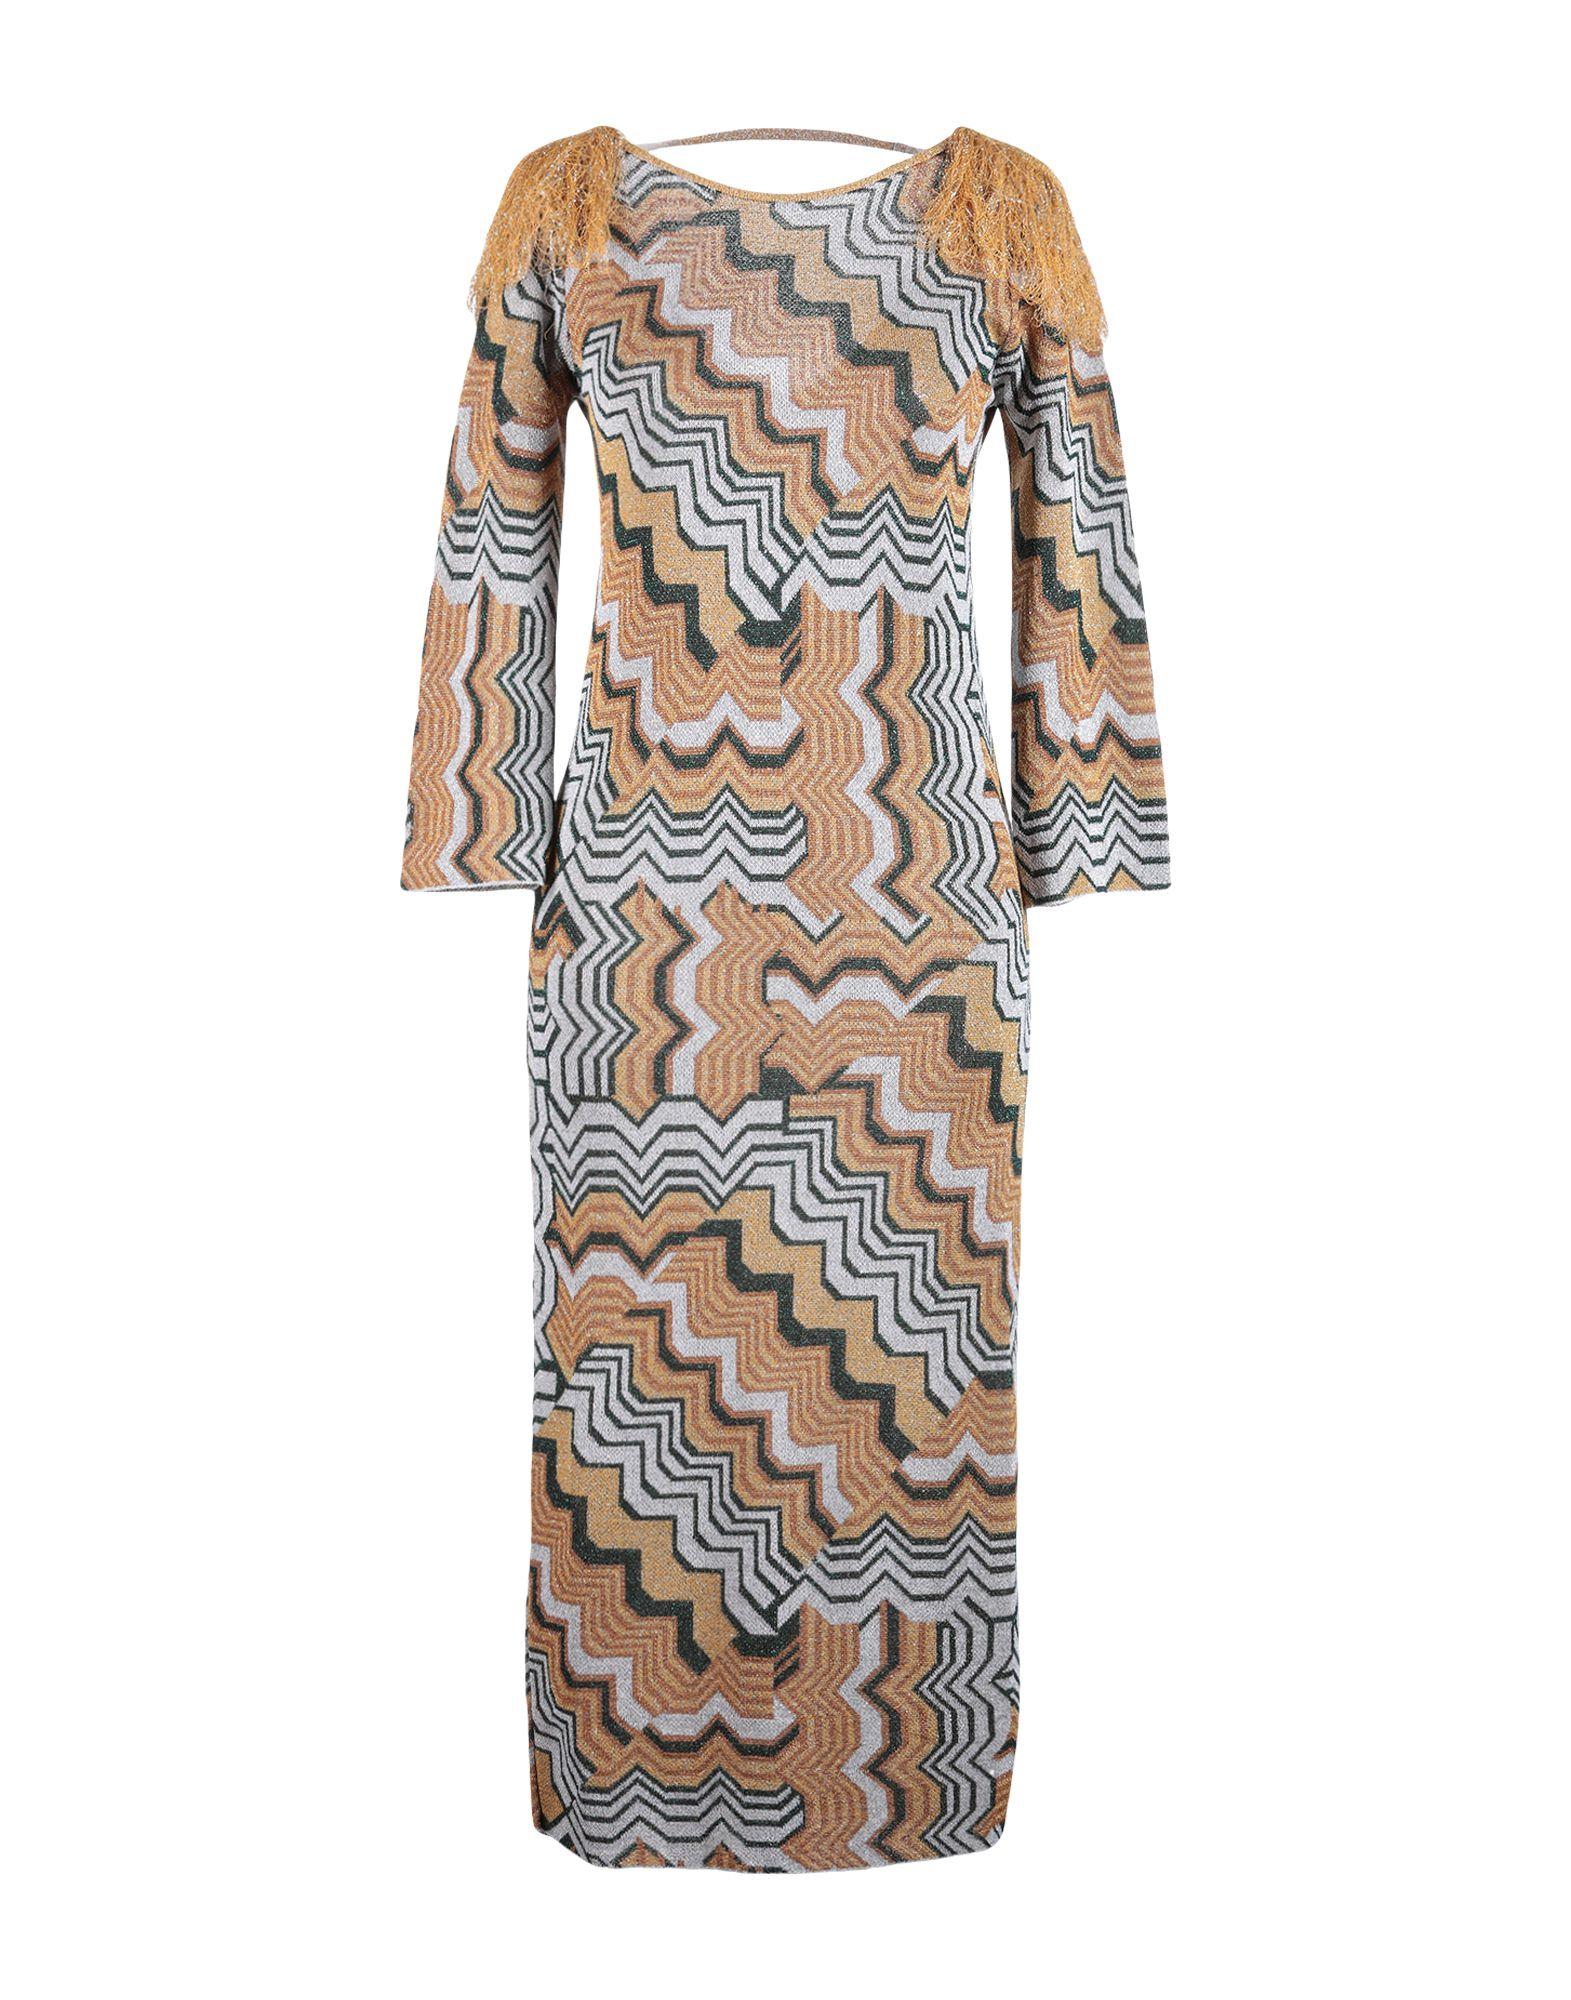 PAOLO CASALINI Платье длиной 3/4 icons платье длиной 3 4